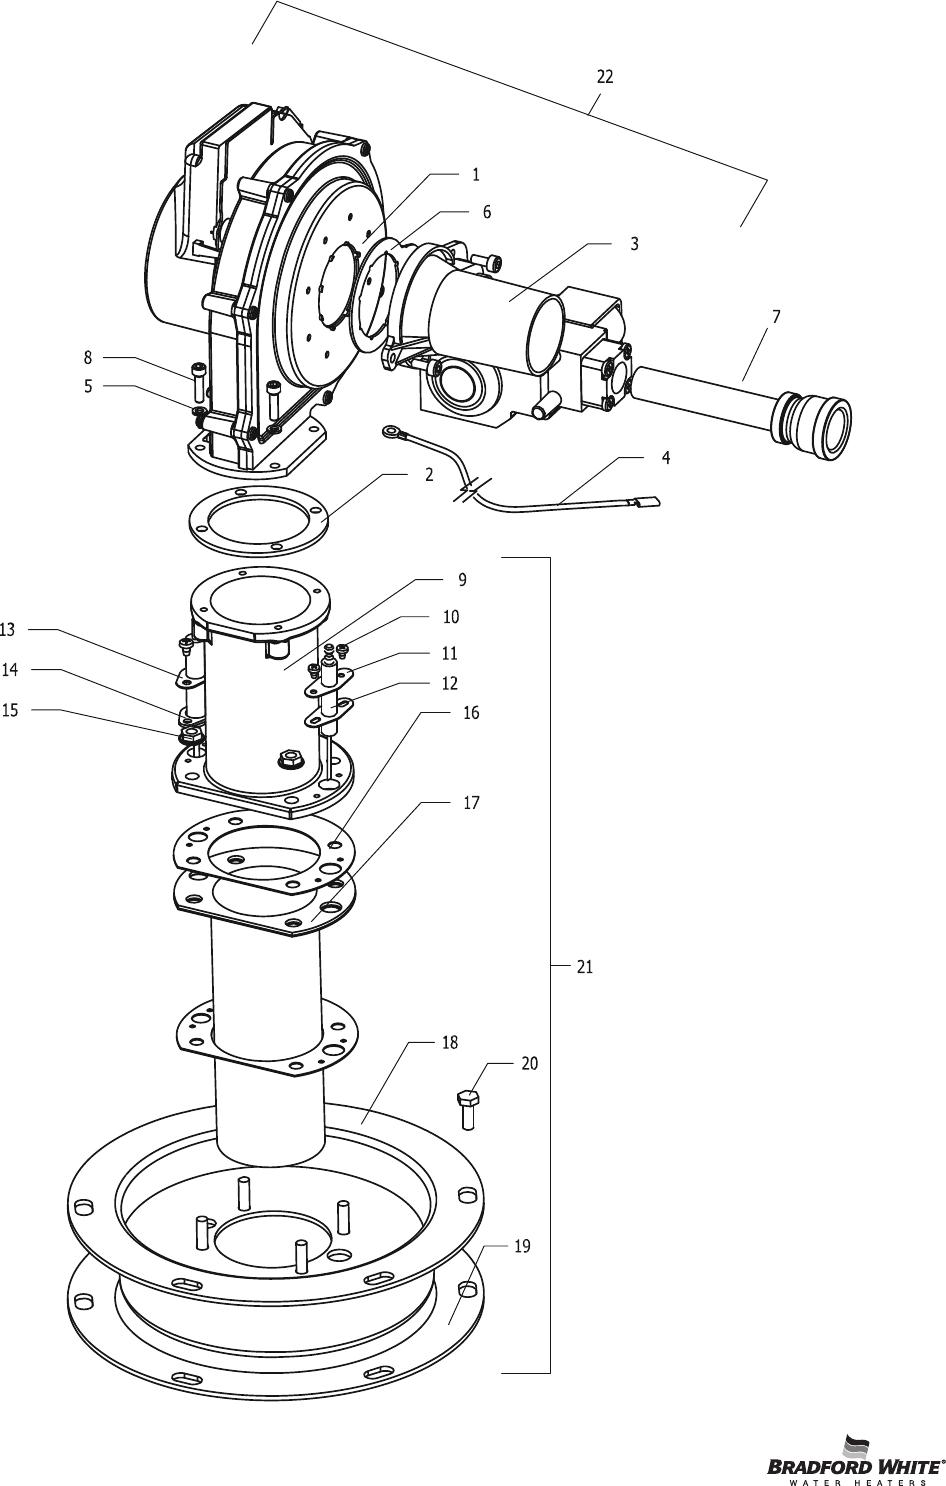 Bradfordwhite 50610 C 31647_50610c_parts_parts_list User